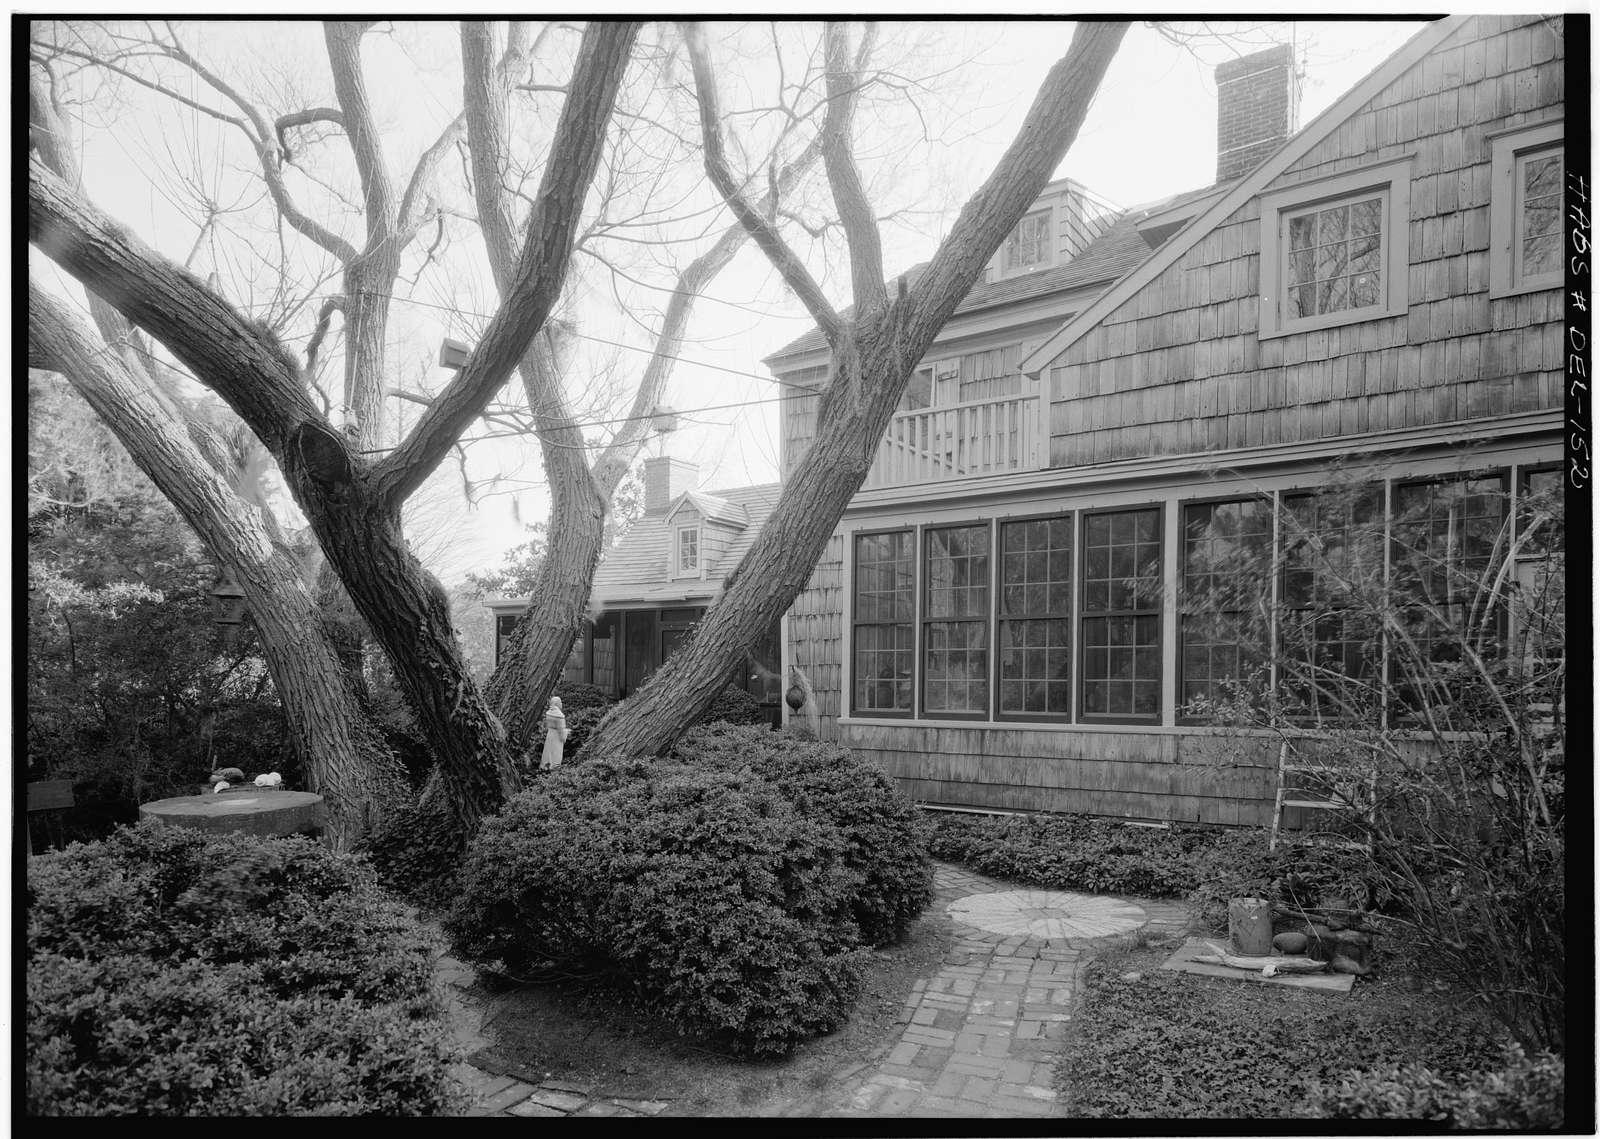 Peter Marsh House, 10 Dodd's Lane, Rehoboth Beach, Sussex County, DE